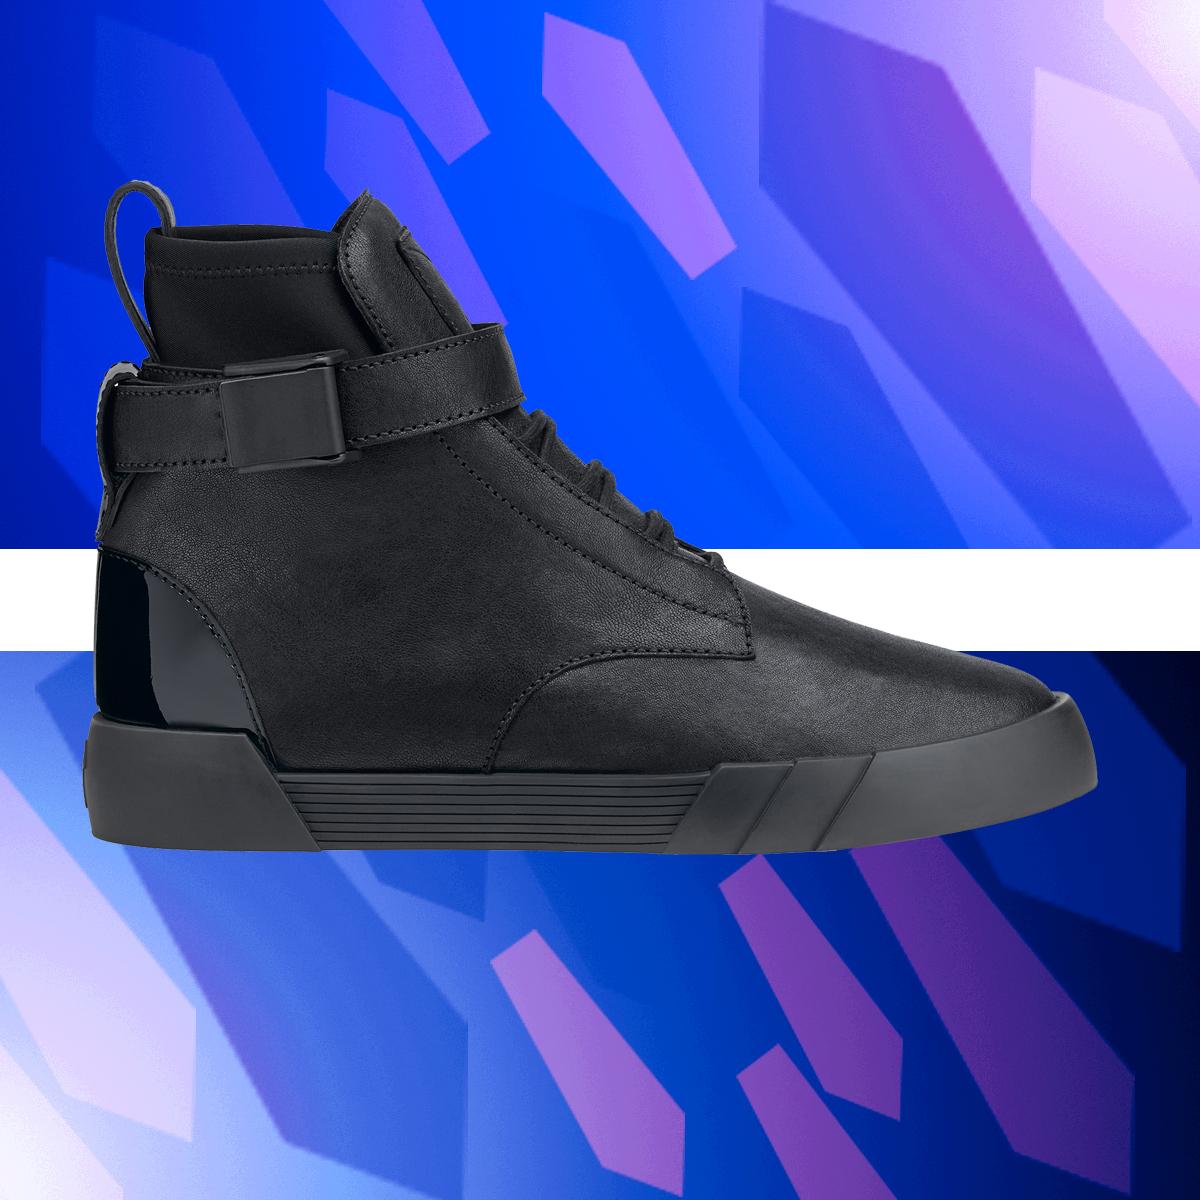 sale retailer abb45 d228b Scarpe da uomo autunno inverno 2016-2017 MFW  EdoardoAlaimo.com